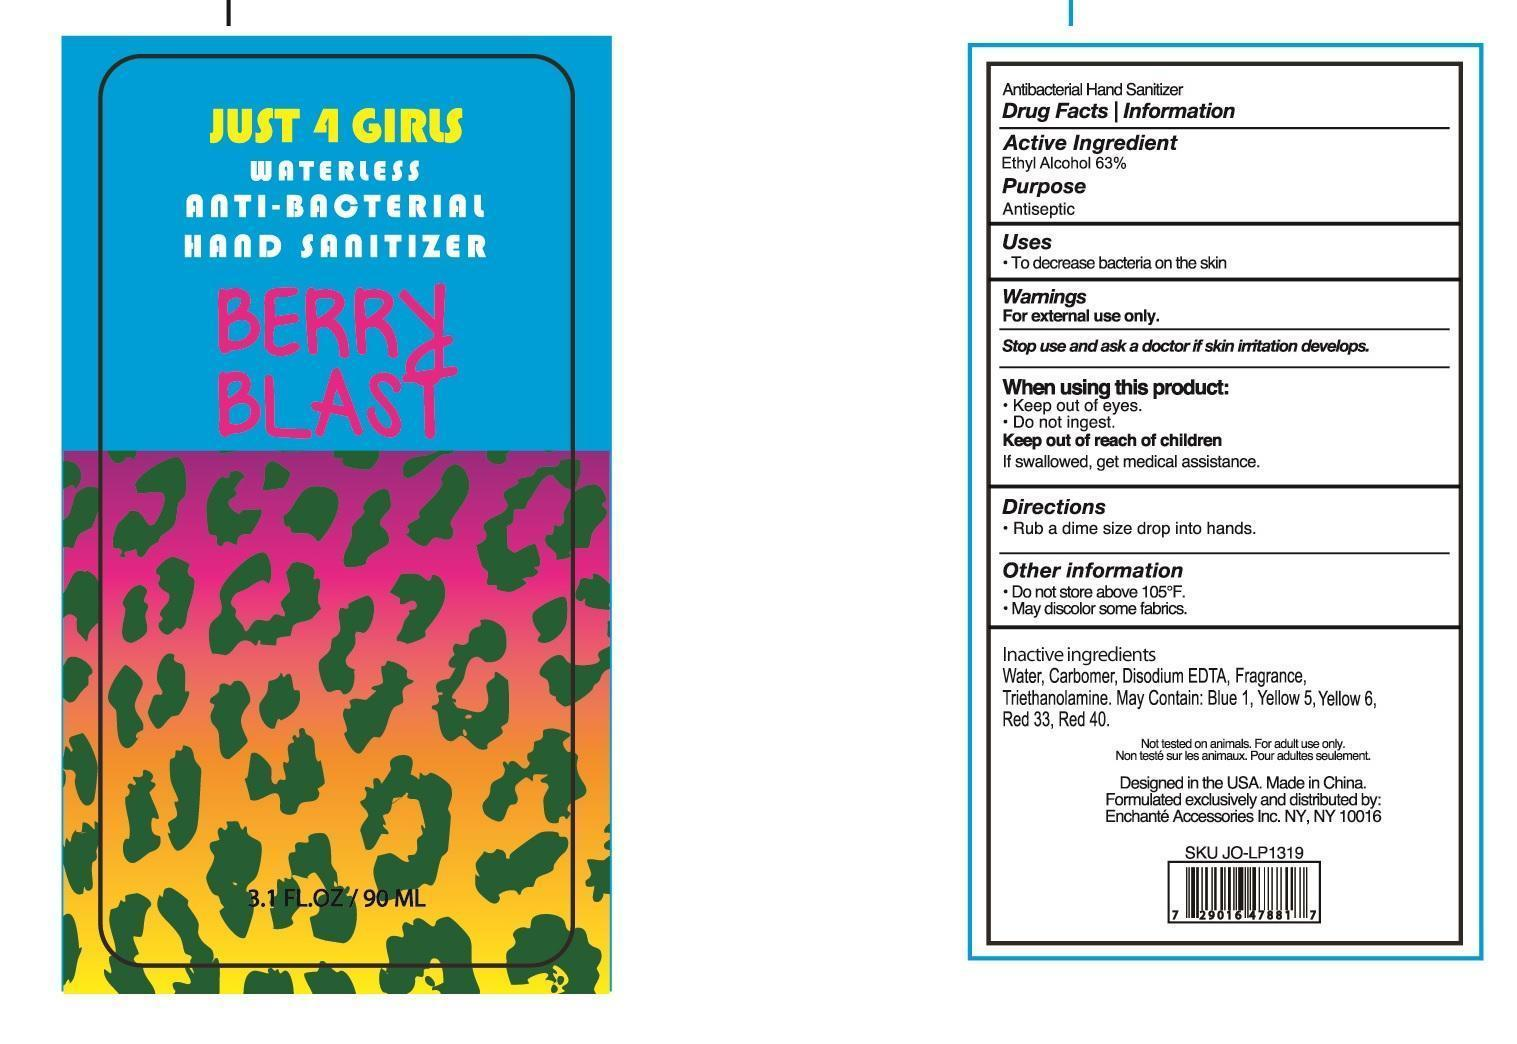 Just 4 Girl Waterless Anti Bacterial Hand Sanitizer Berry Blast (Alcohol) Liquid [Enchante Accessories Inc. ]